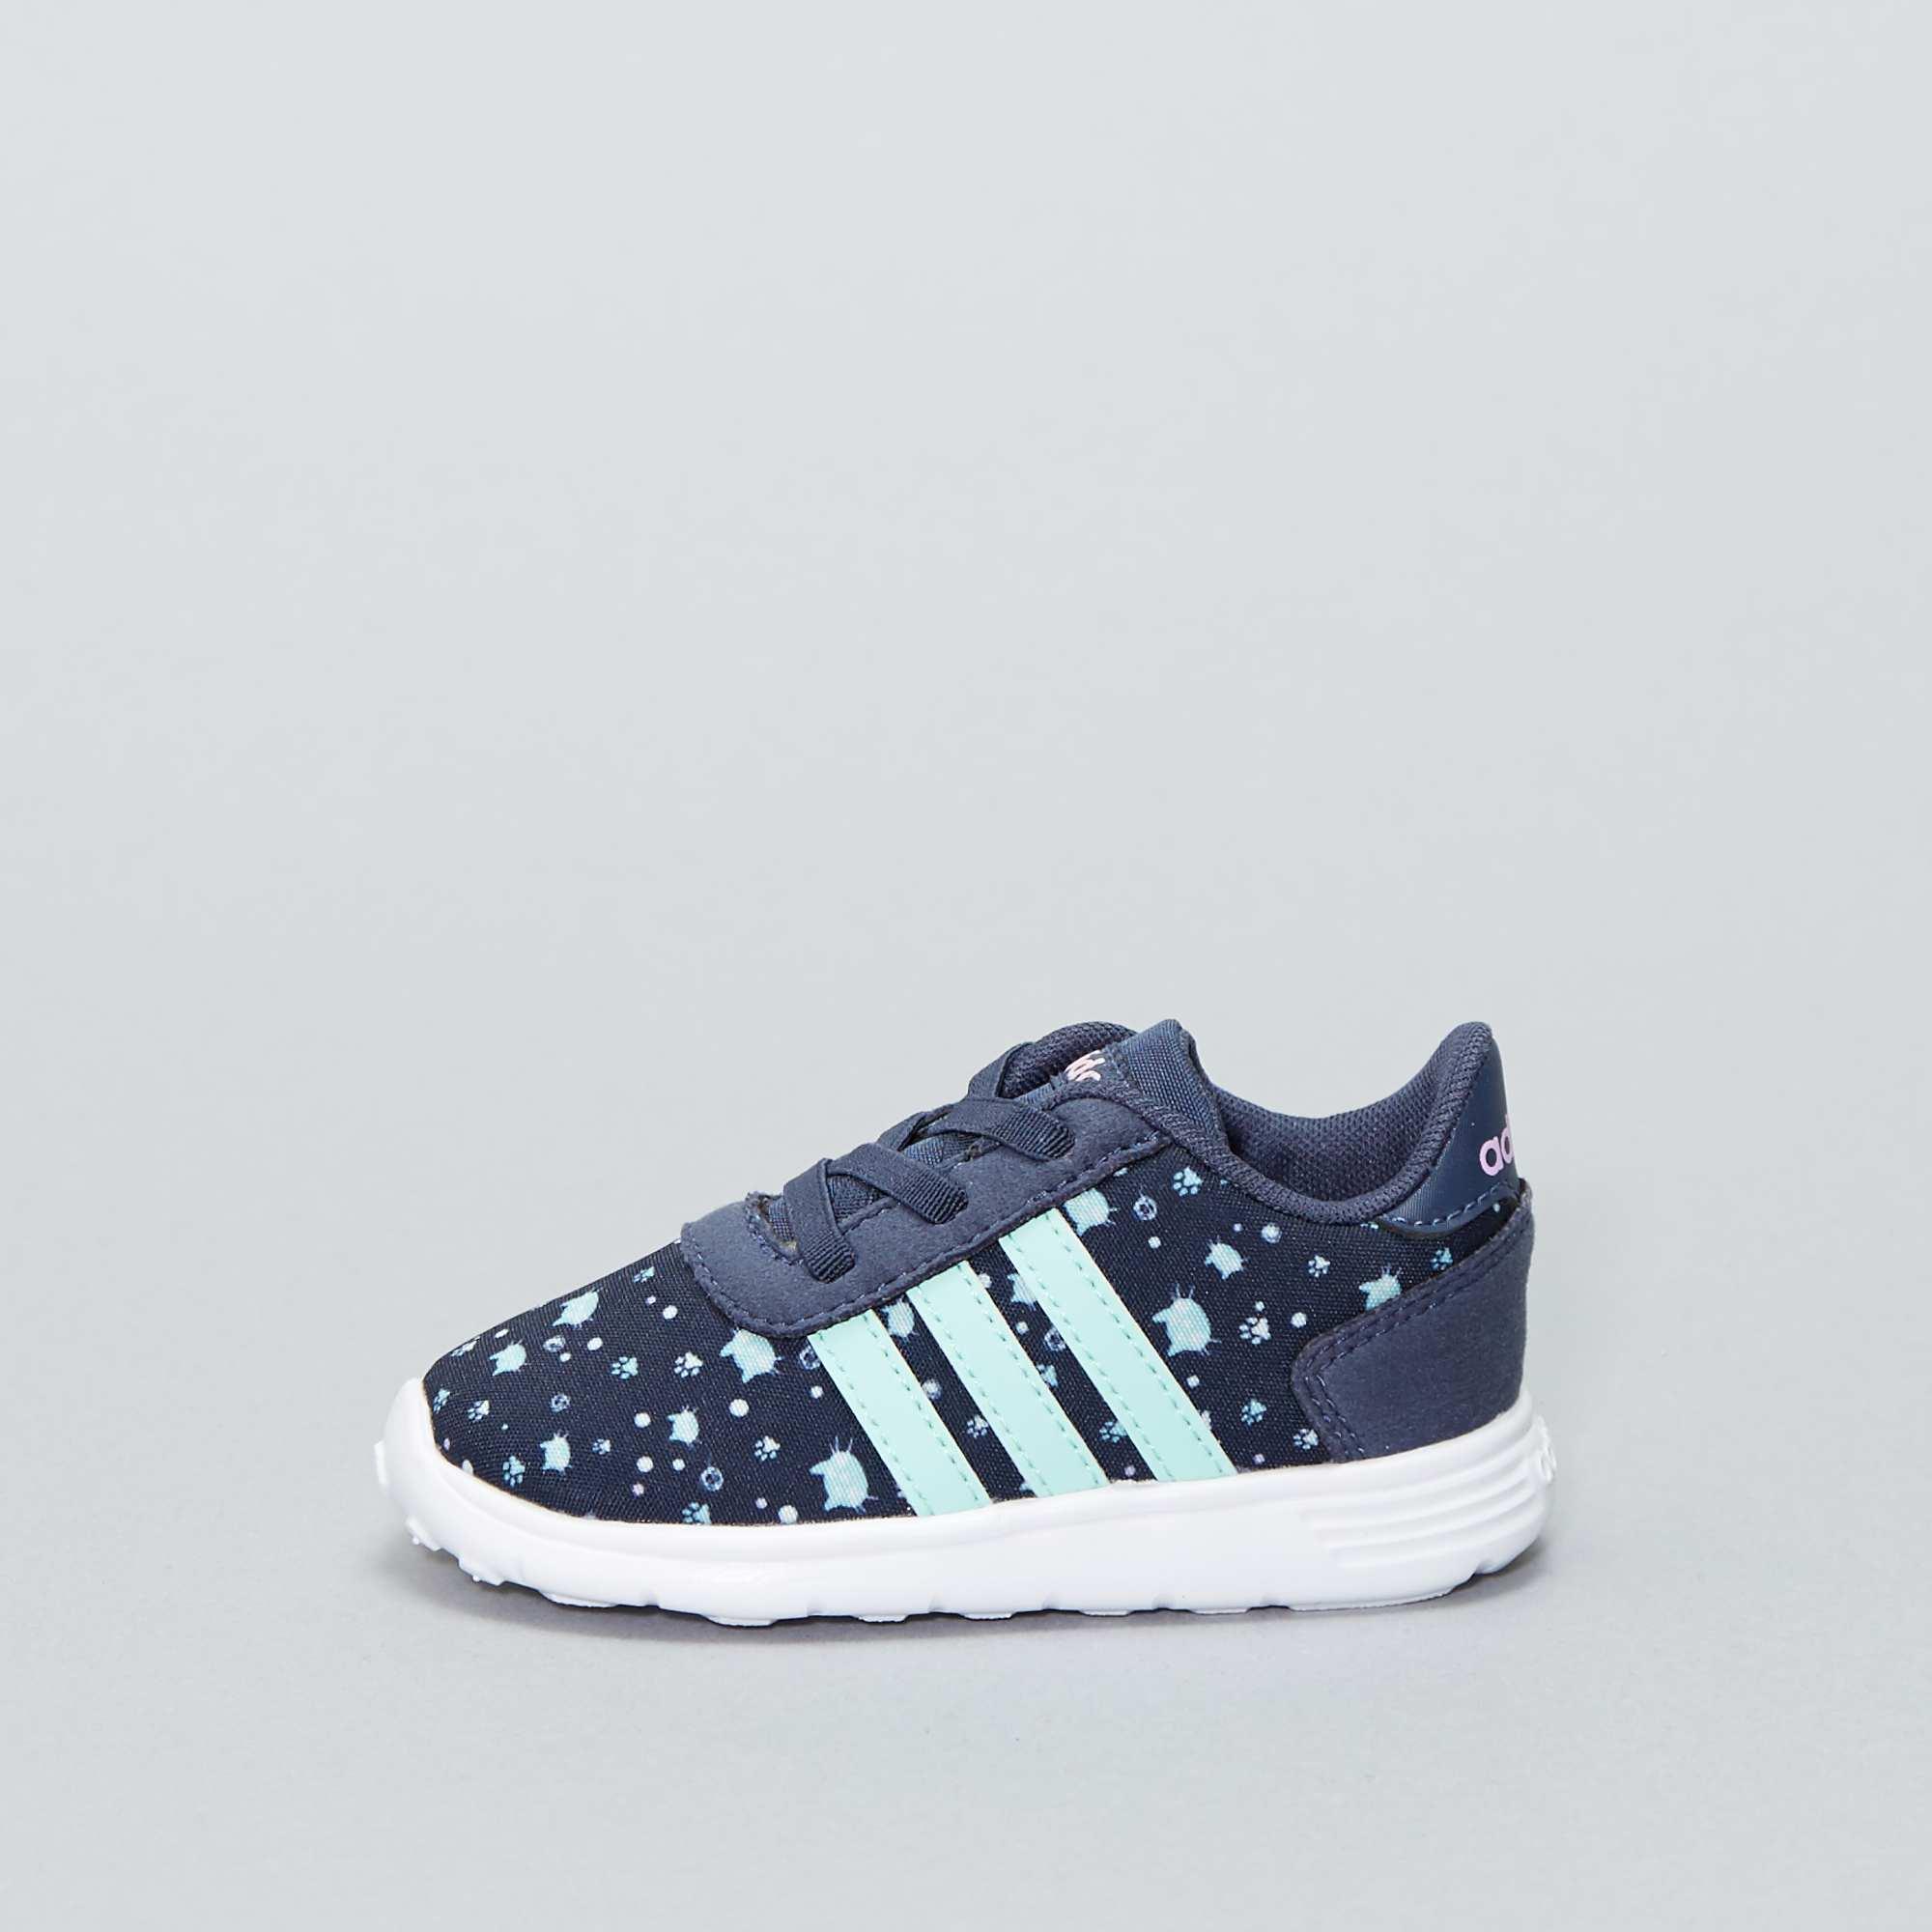 cheap for discount e6df5 c8d7d Zapatillas deportivas  Adidas Lite Racer INF  AZUL Bebé niña. Loading zoom.  Haz clic en la imagen para agrandar. zoom